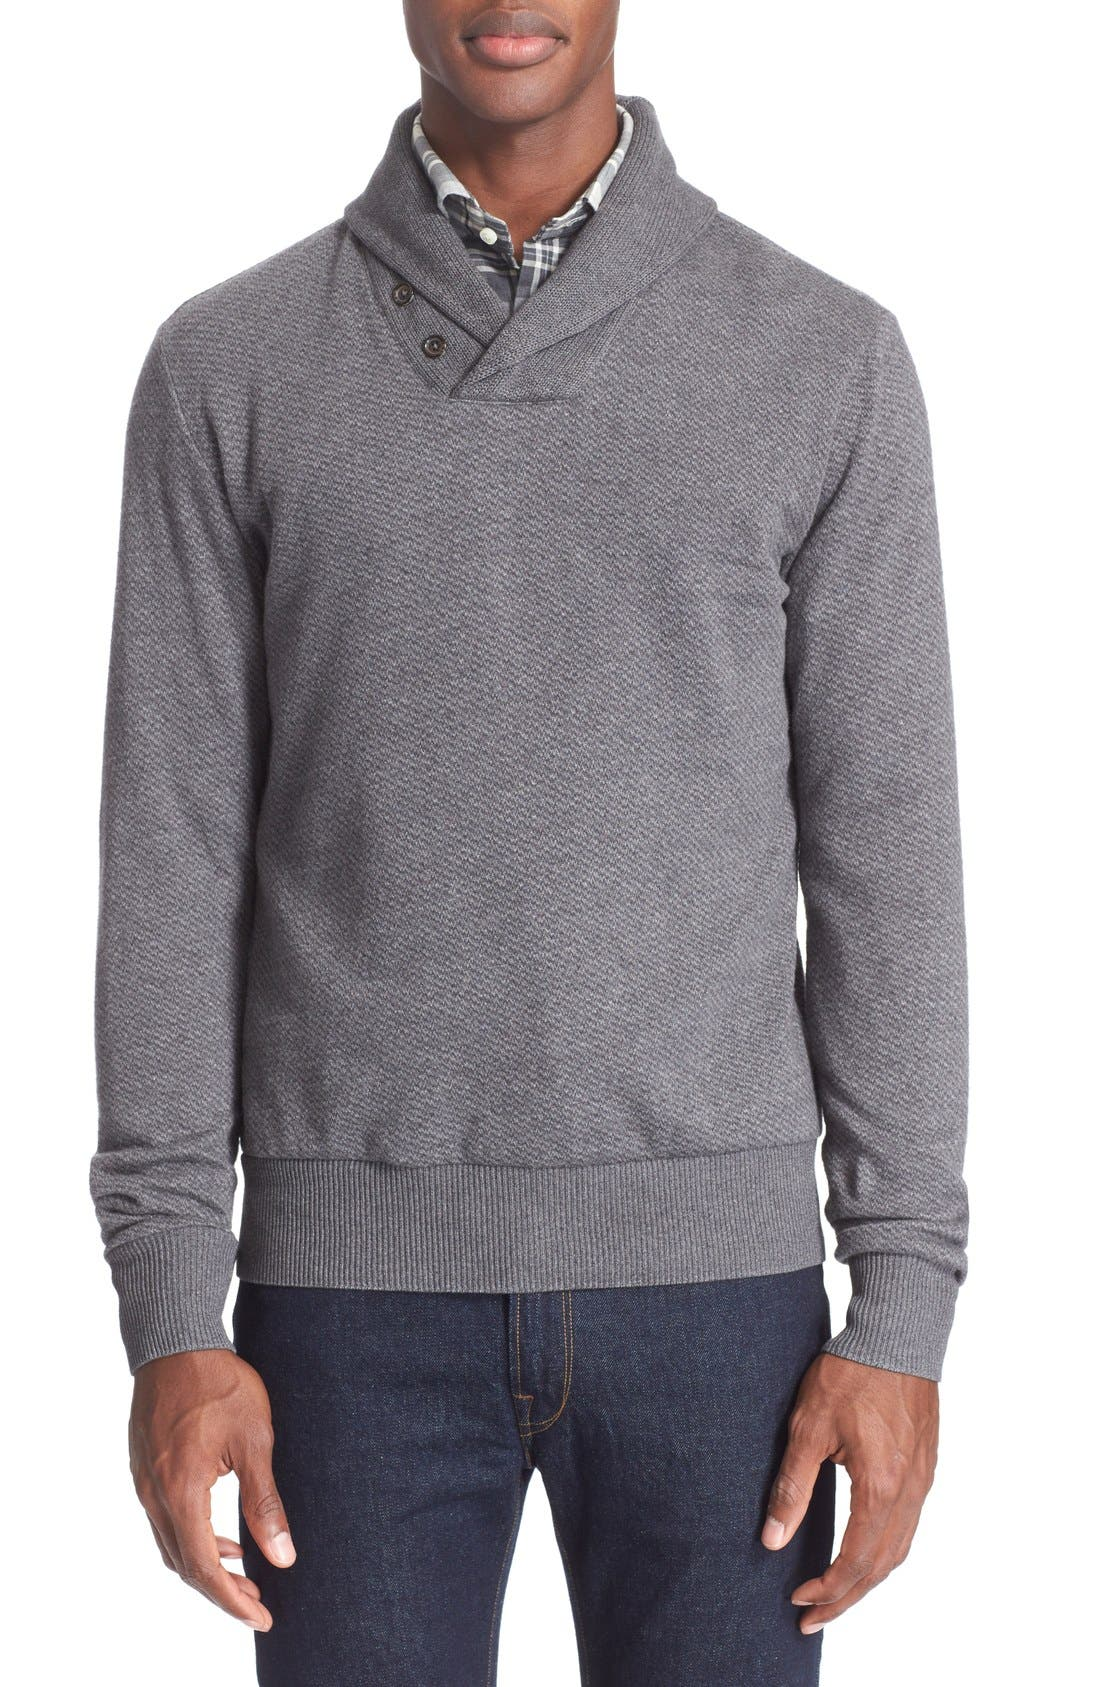 POLO RALPH LAUREN,                             Shawl Collar Sweater,                             Main thumbnail 1, color,                             020